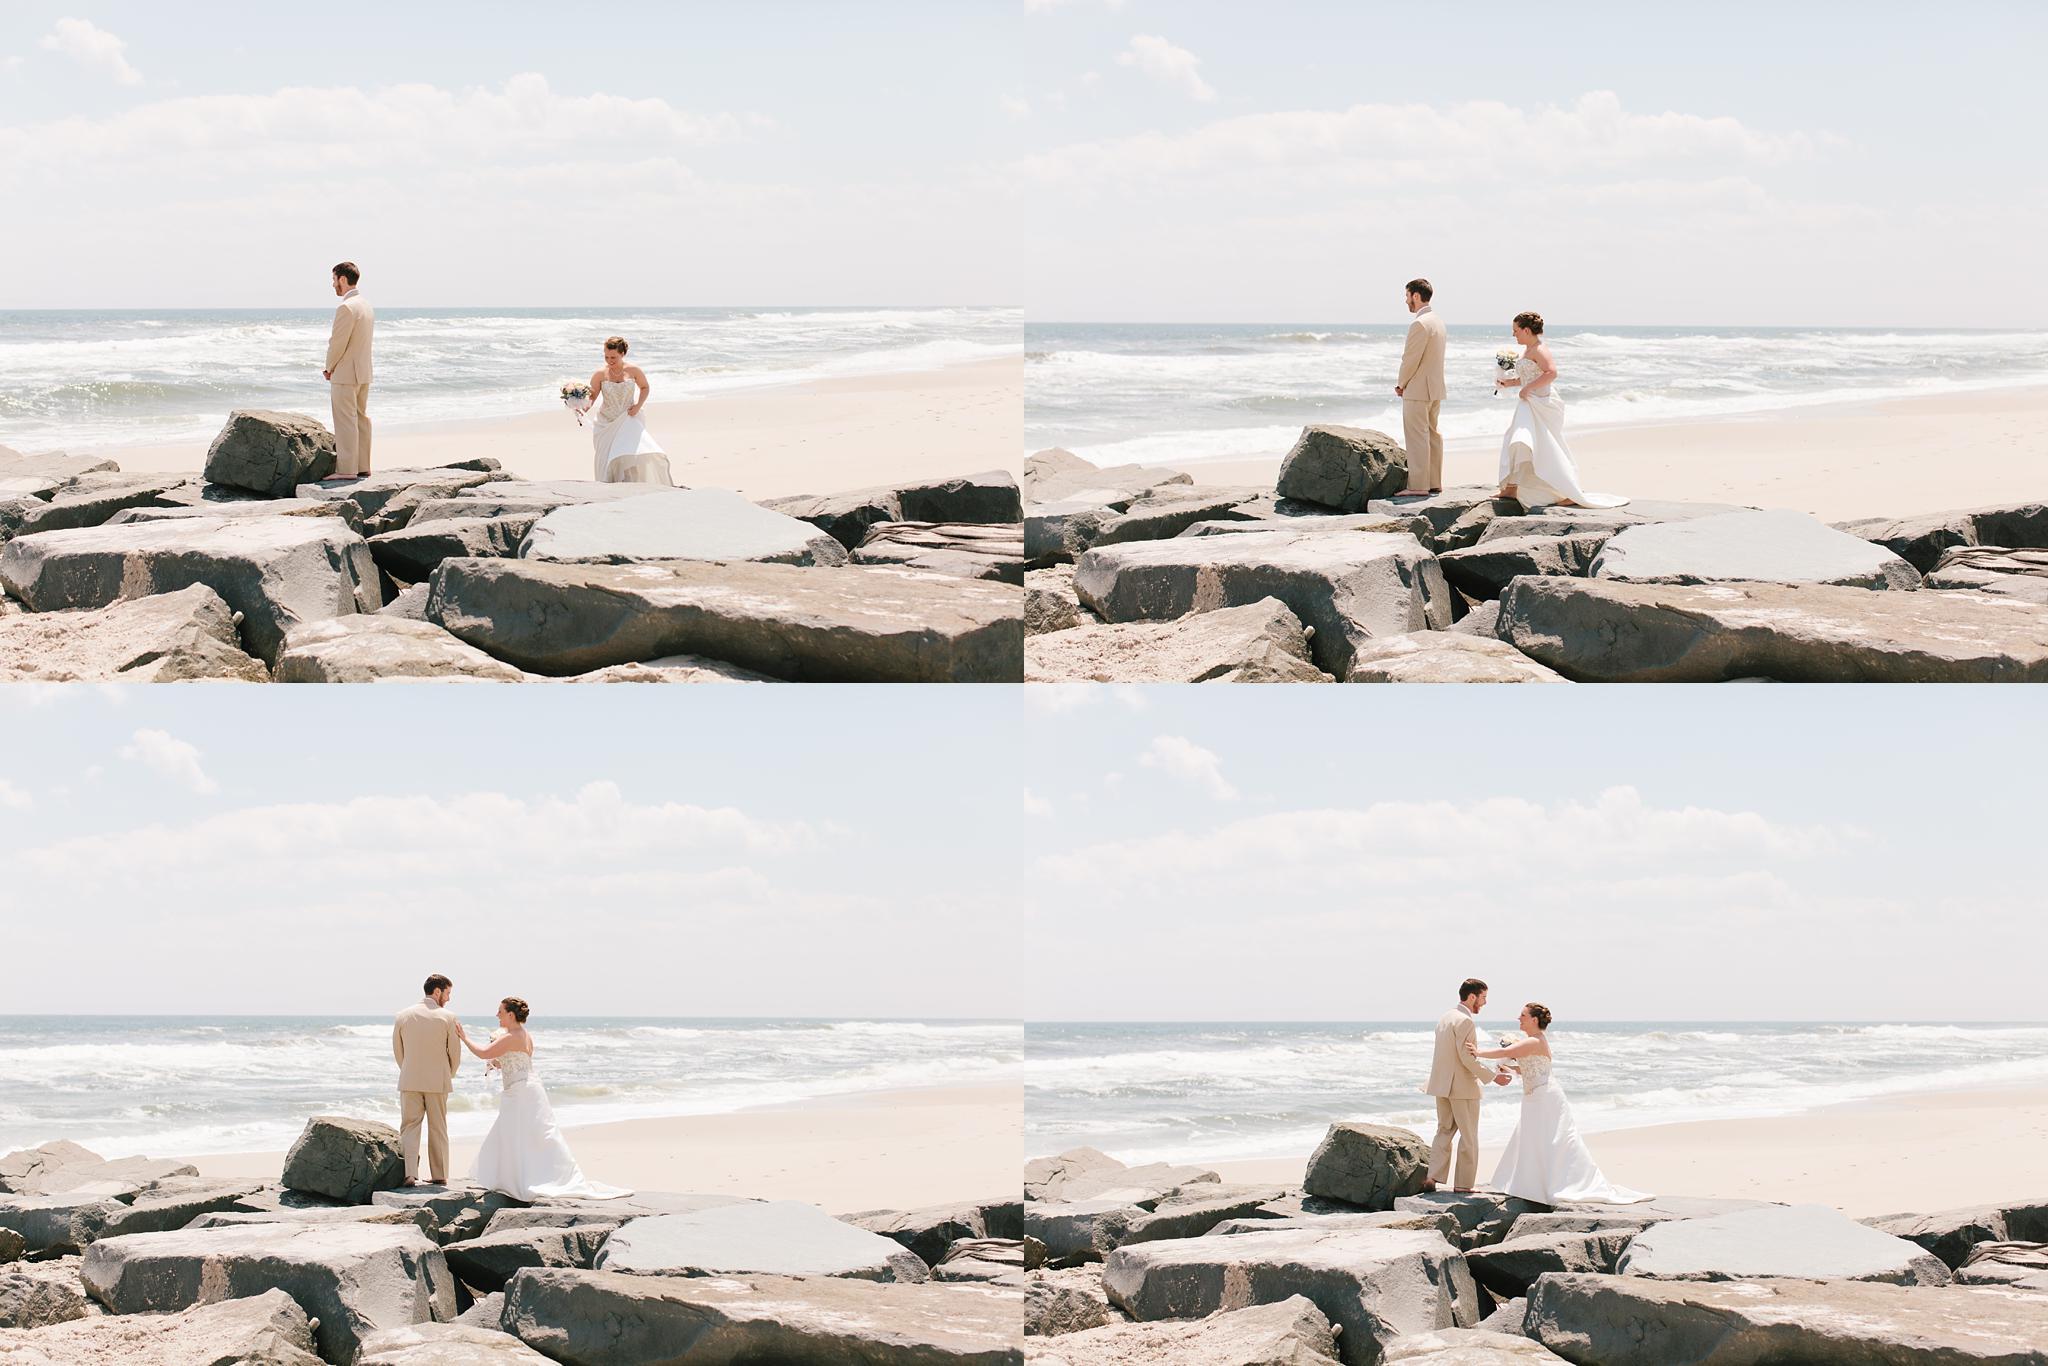 brant_beach_yacht_club_wedding_long_beach_island_nj_wedding_photographer_82.jpg